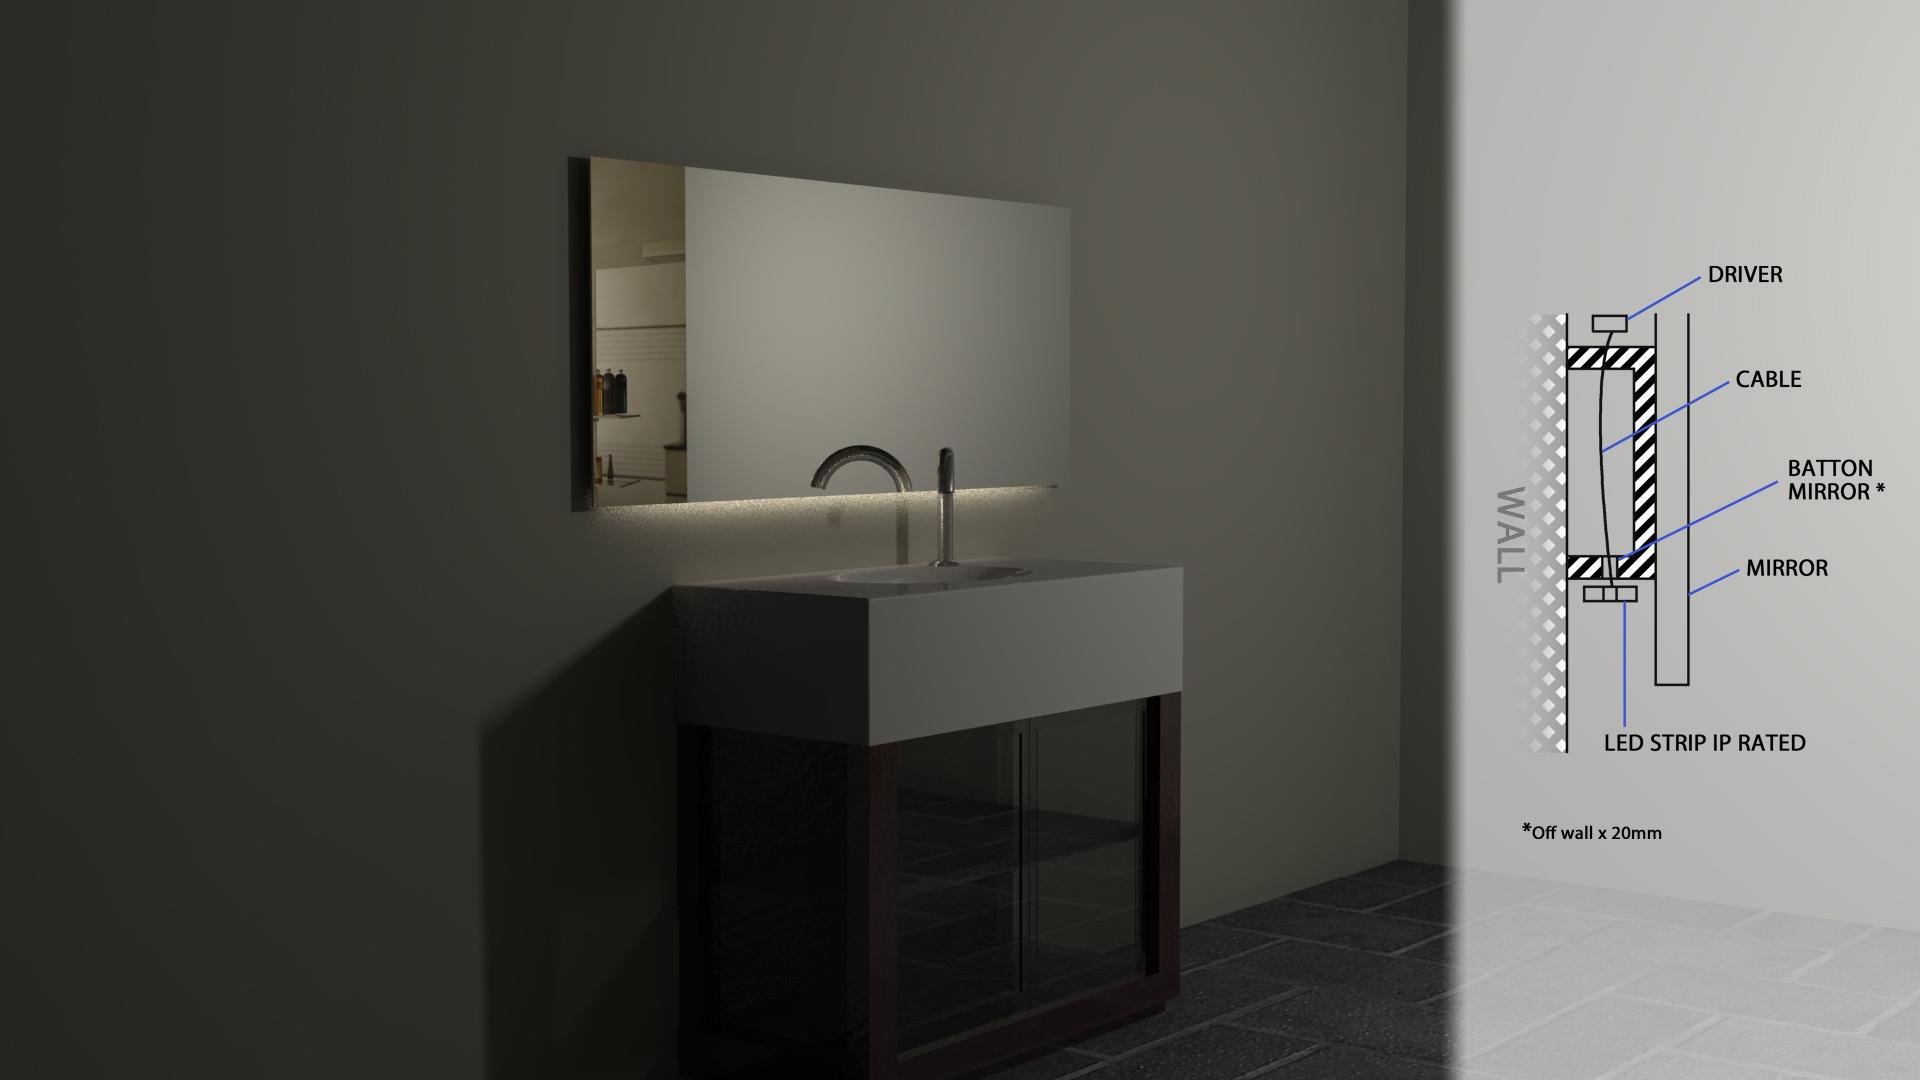 Led Lights Behind Bathroom Mirror